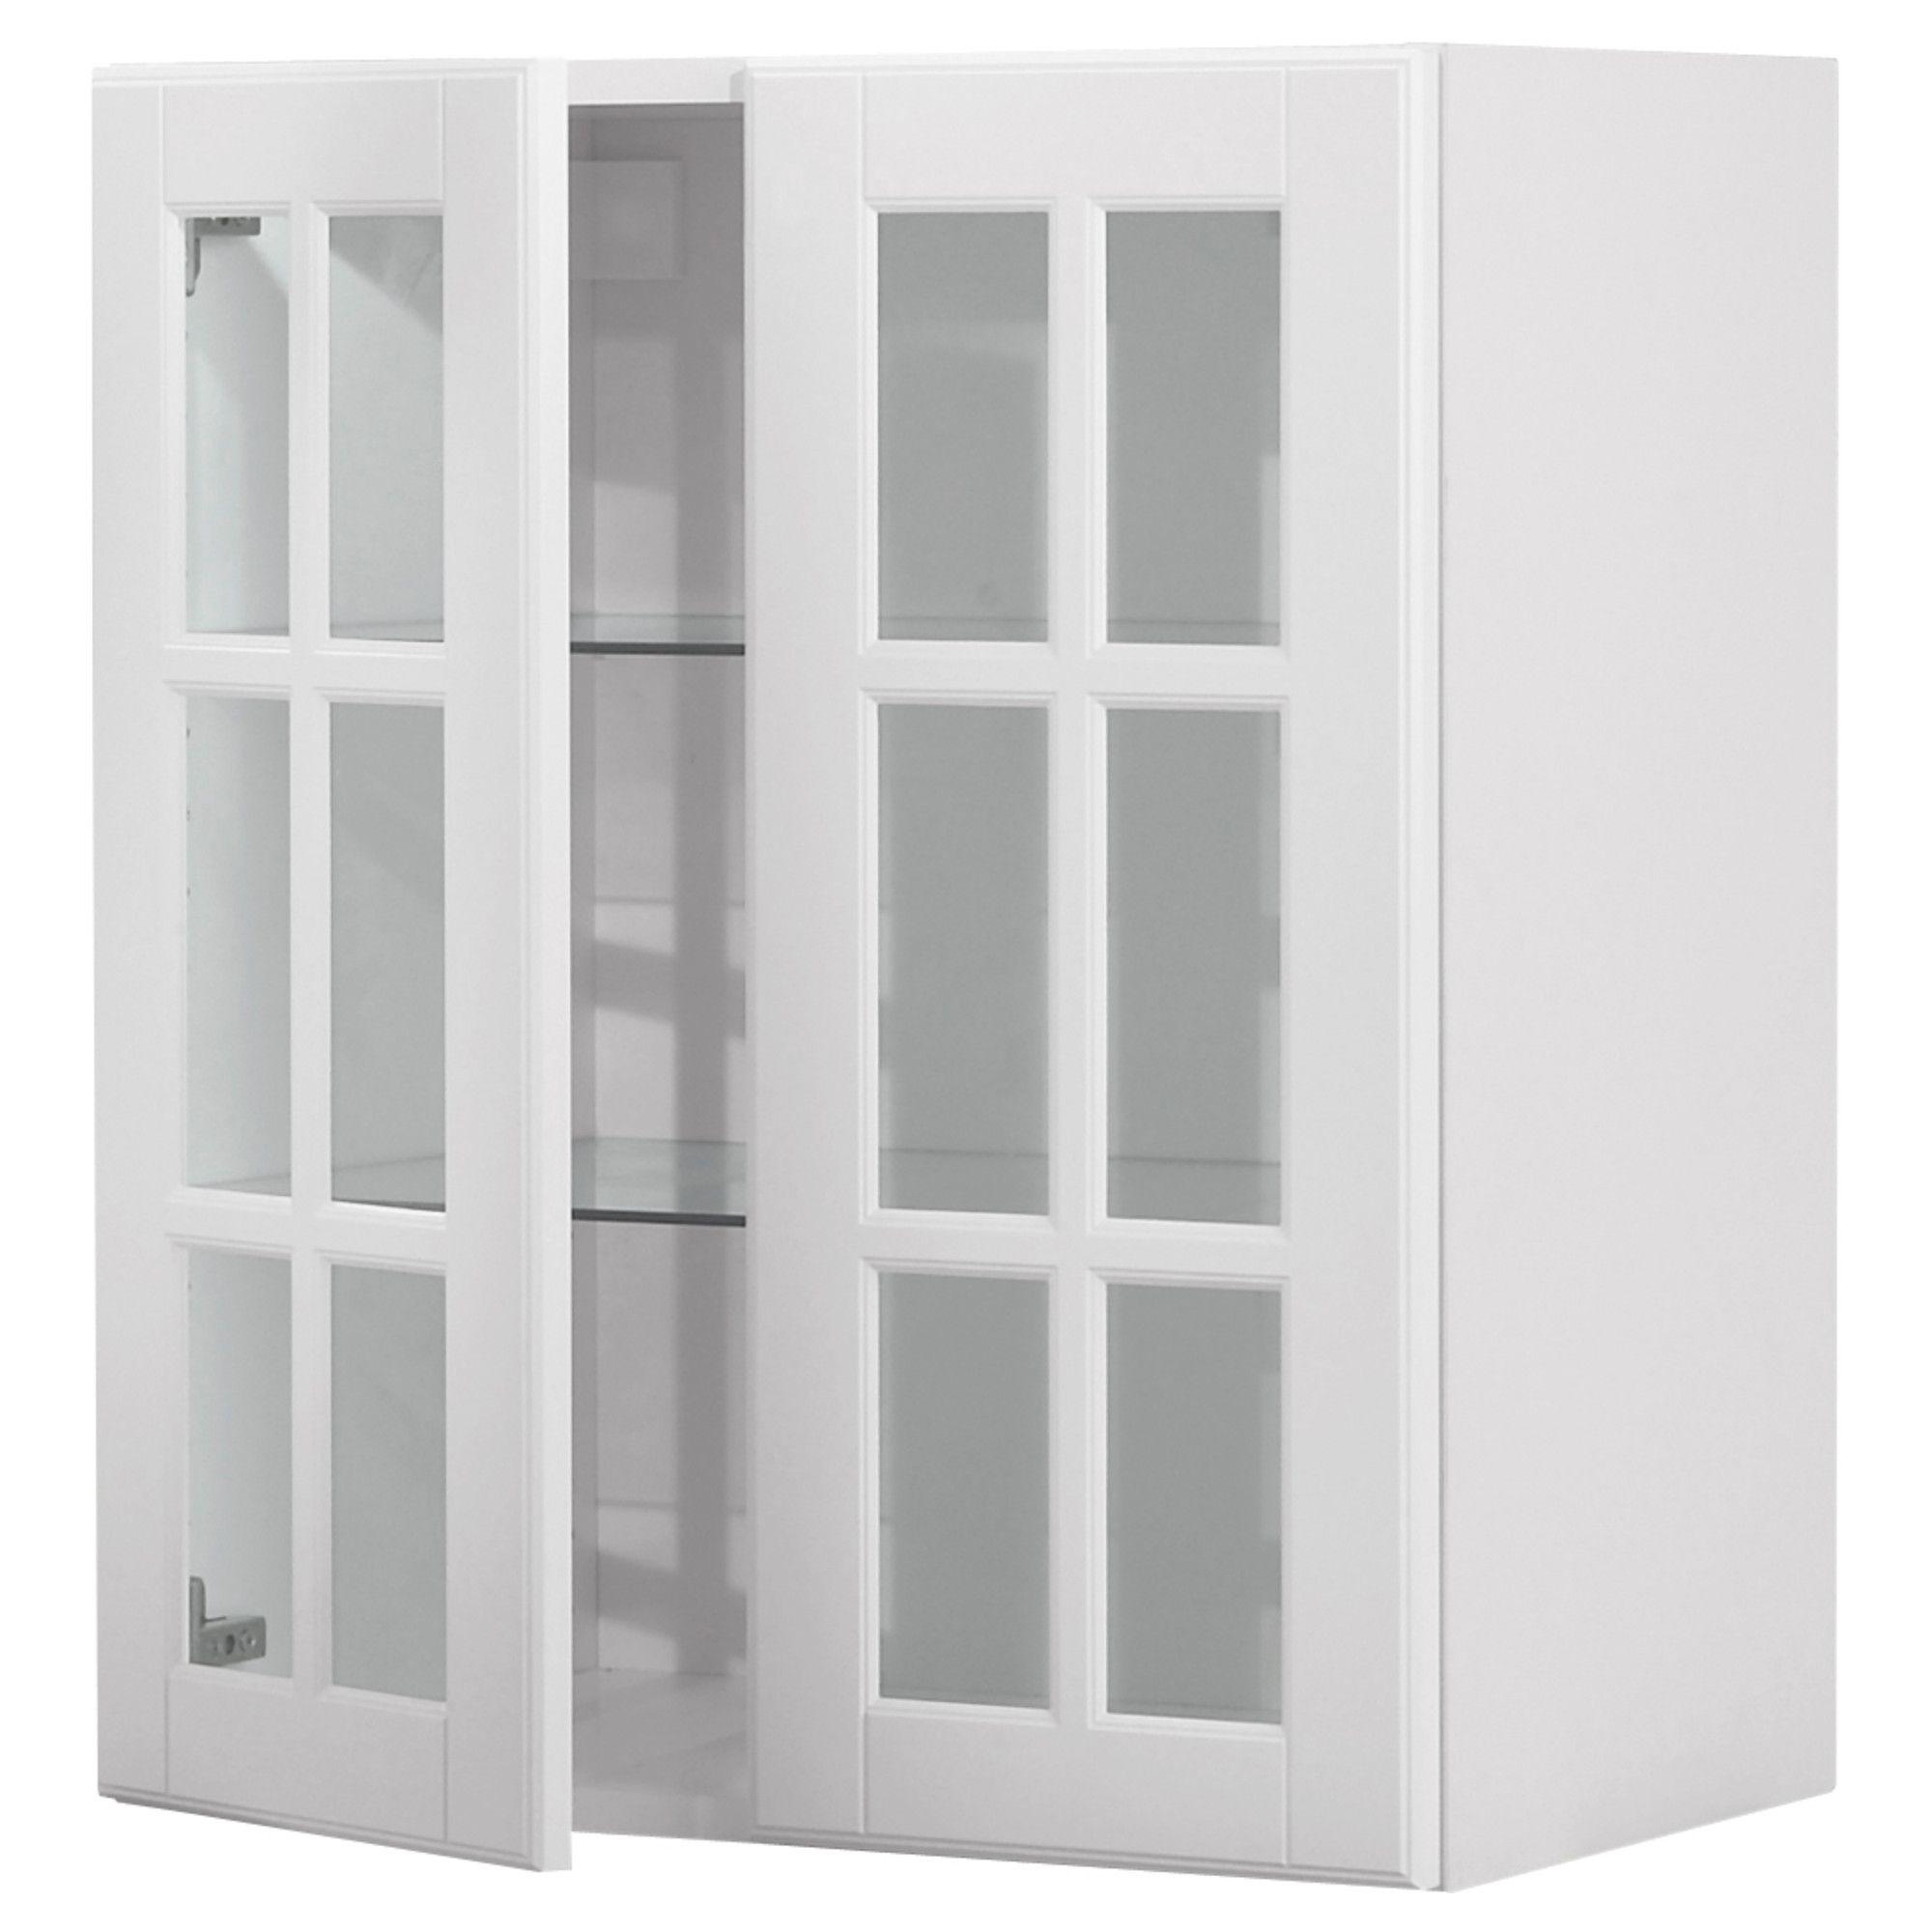 FAKTUM Lidingö IKEA. pretty kitchen cabinet | future | Pinterest